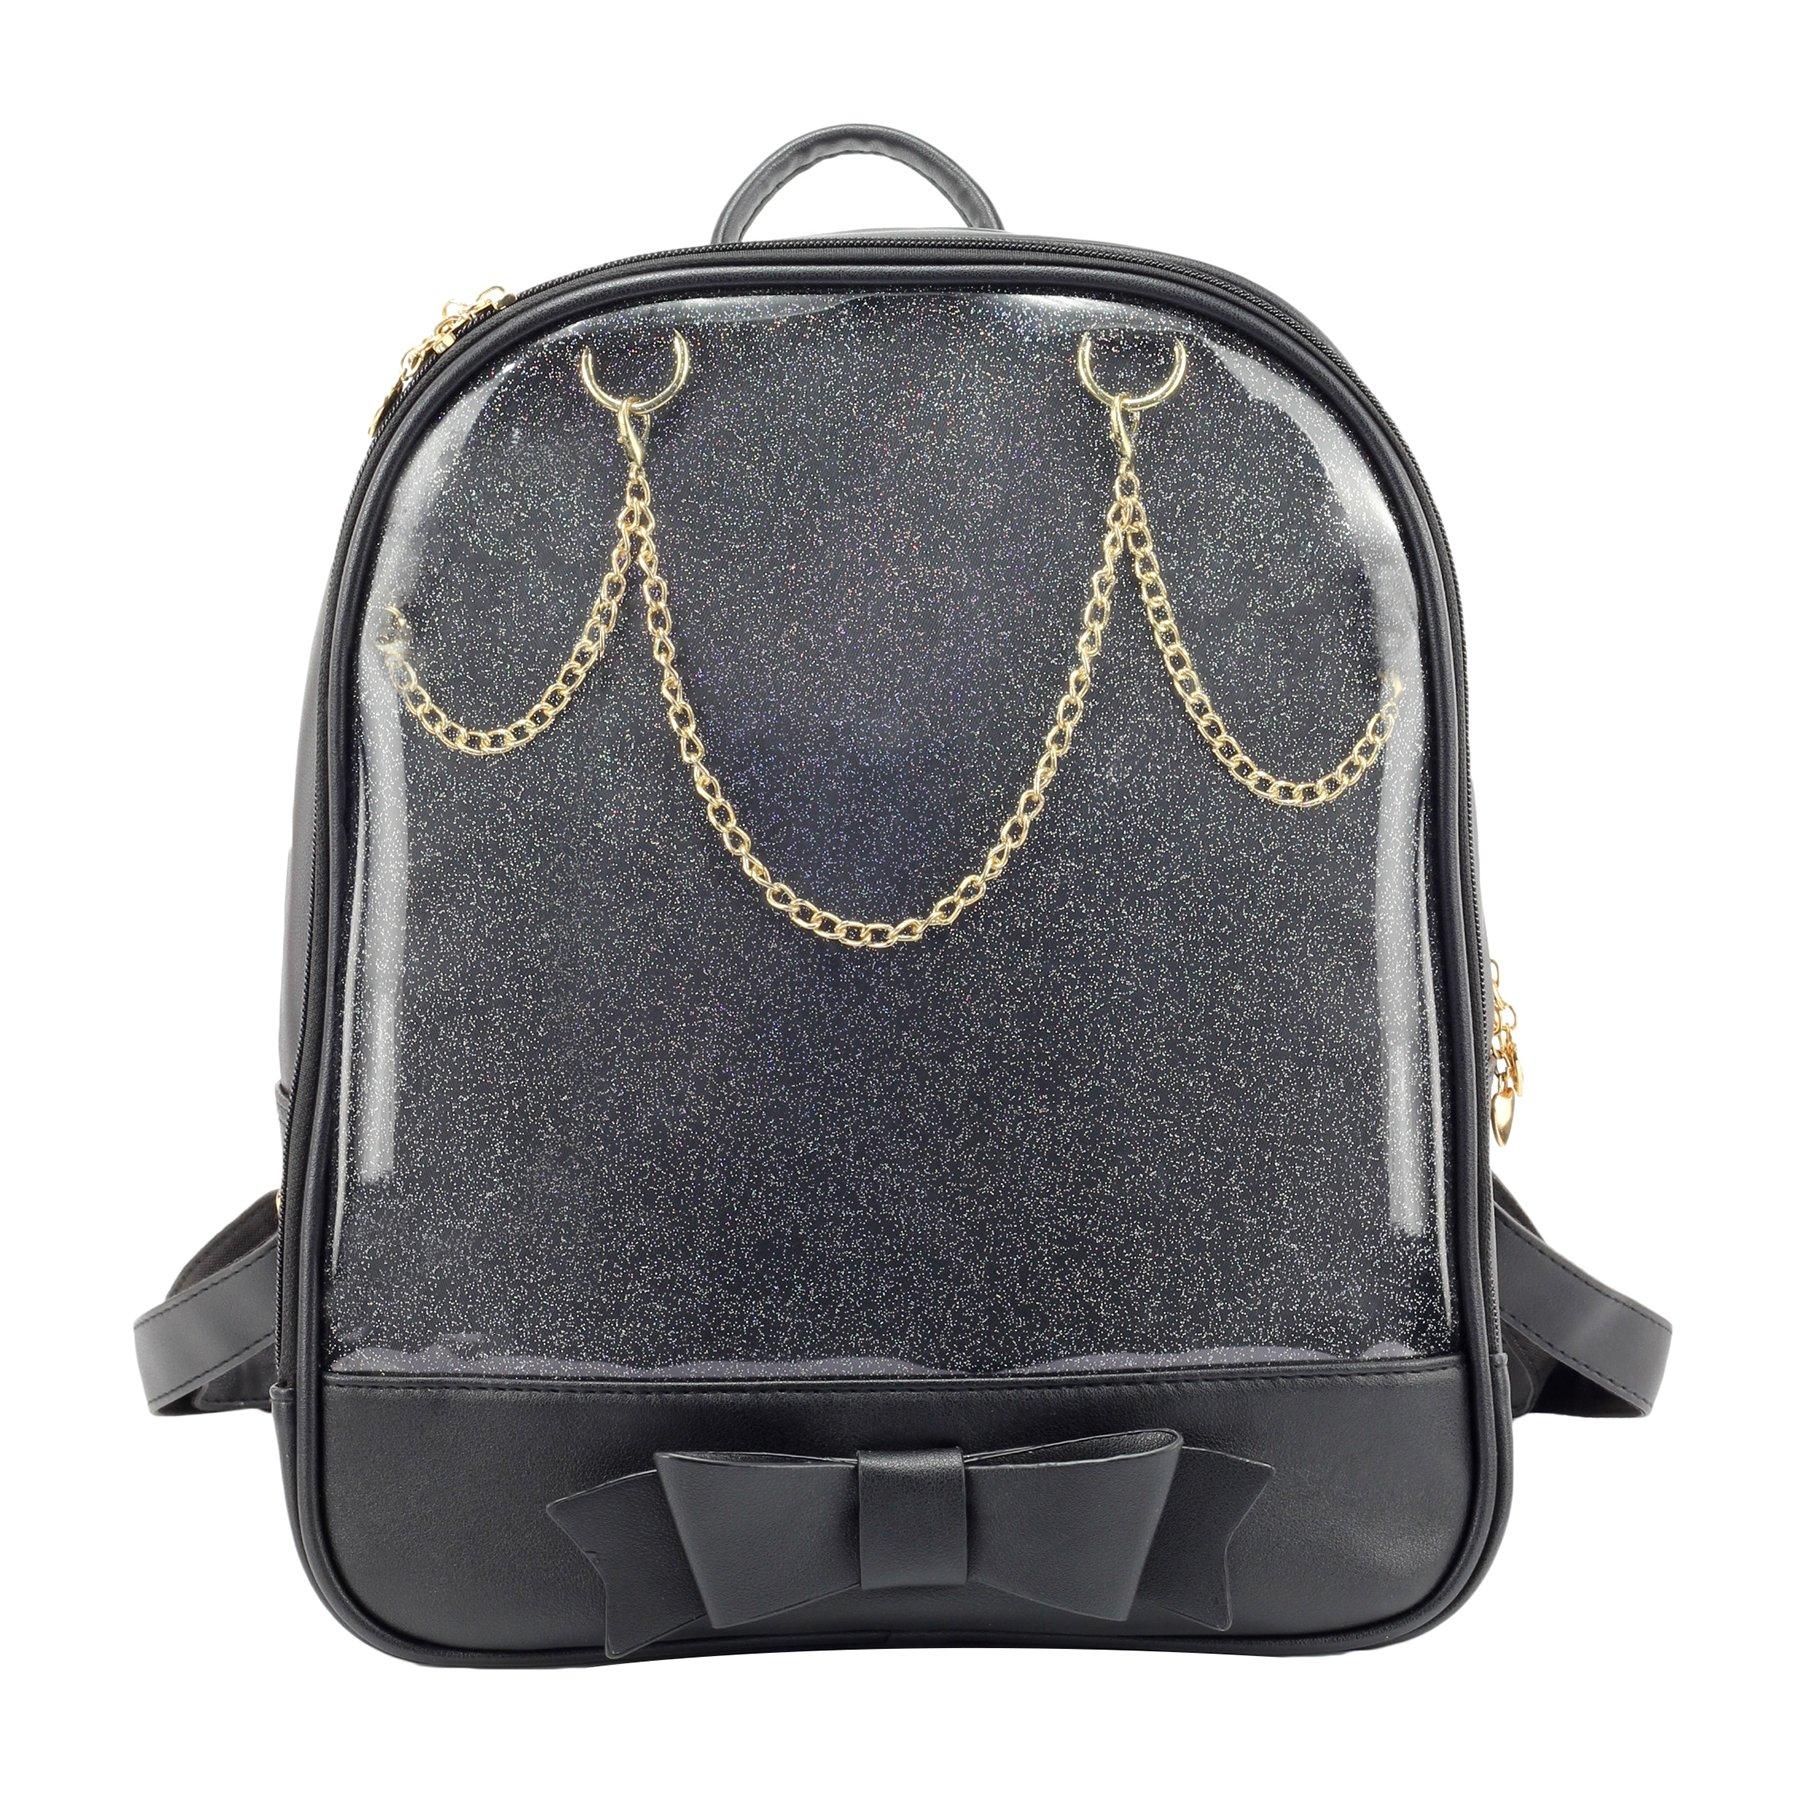 SteamedBun Ita Bag Candy Leather Backpack Bowknot Transparent Beach Girls School Bag Black